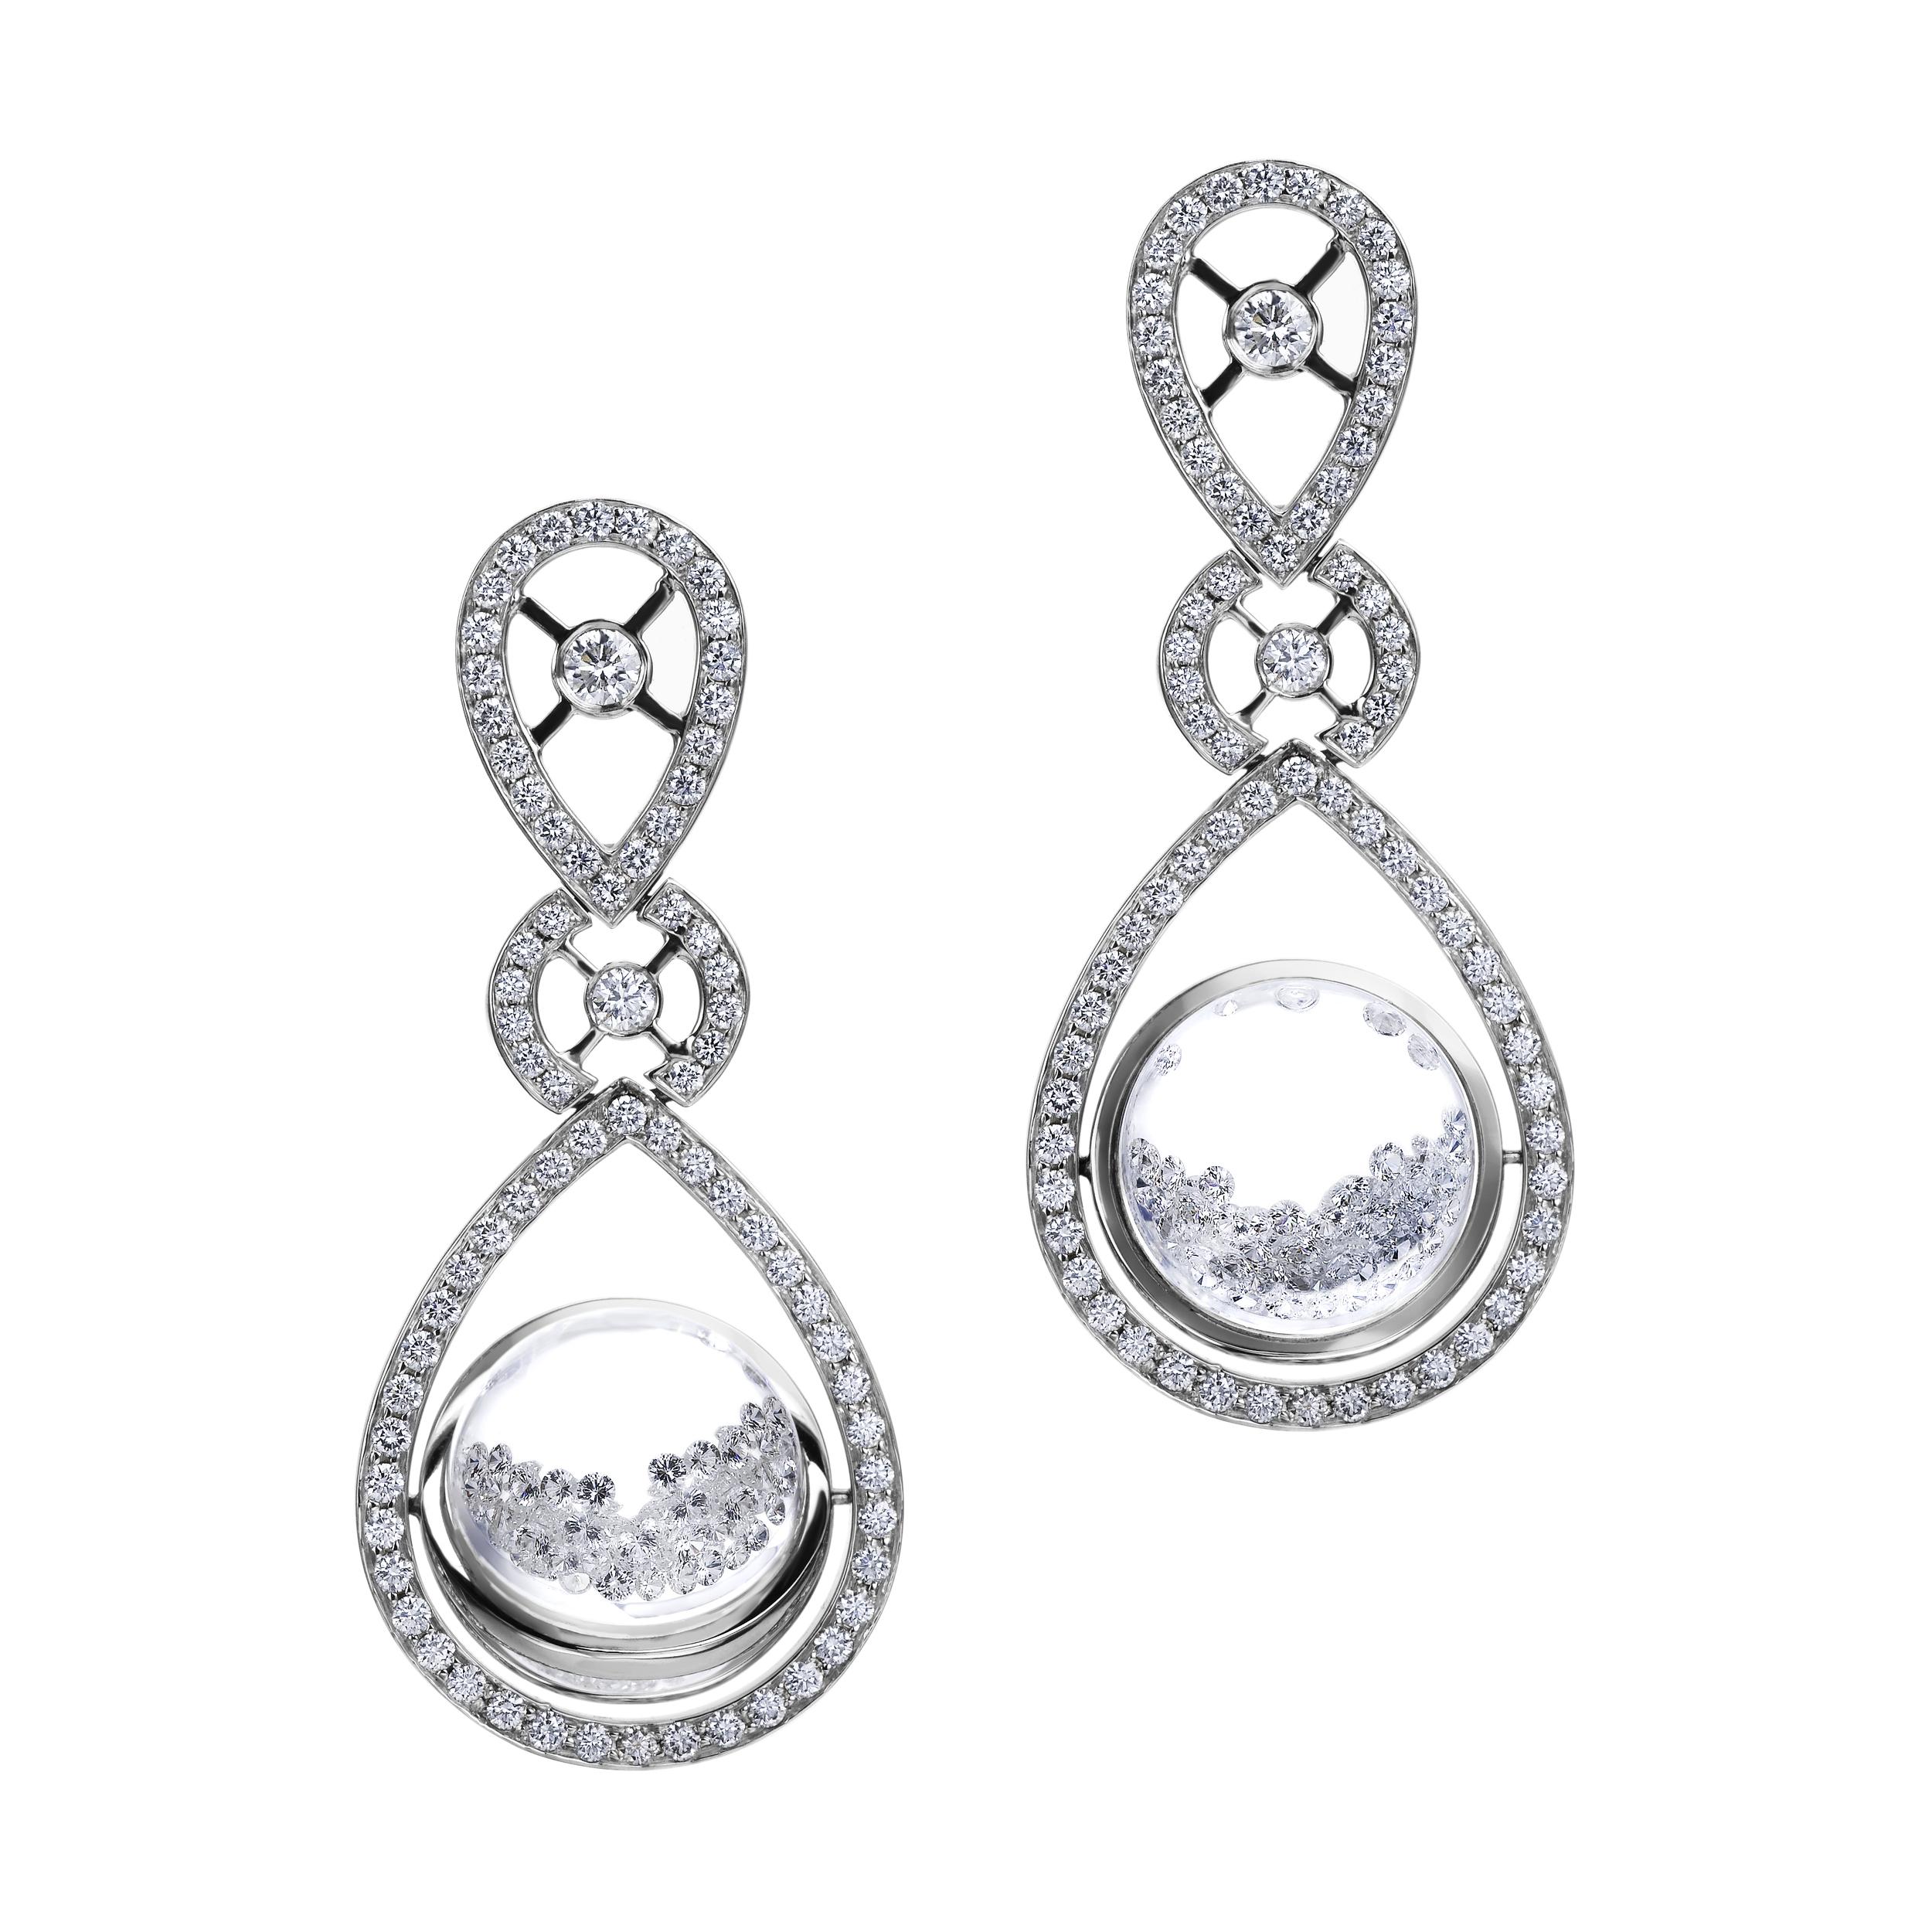 Reena Ahluwalia_Stars of Africa_Royal Asscher_Earrings.jpg